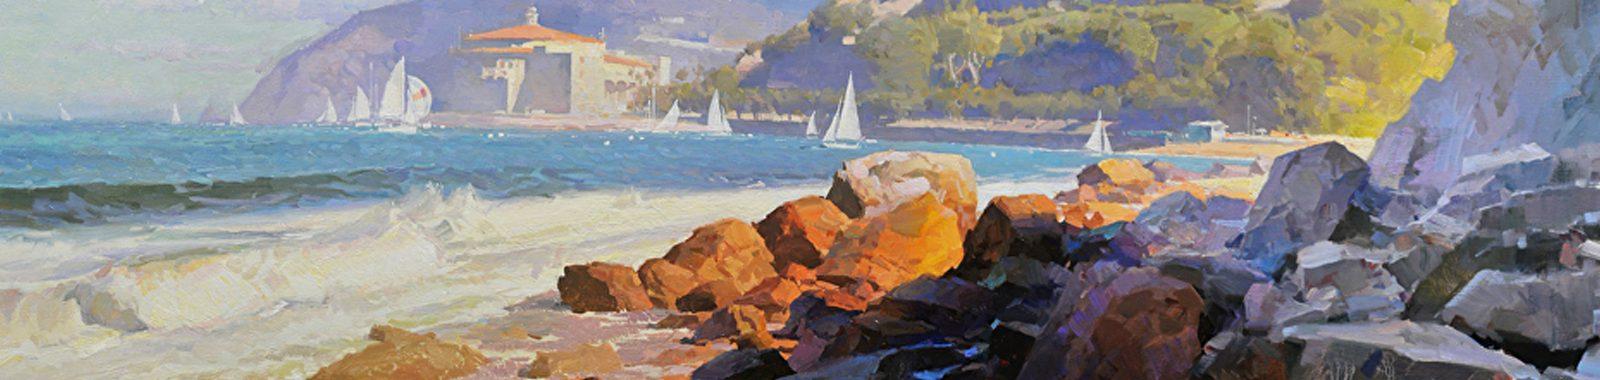 """Catalina Island"" by Calvin Liang"